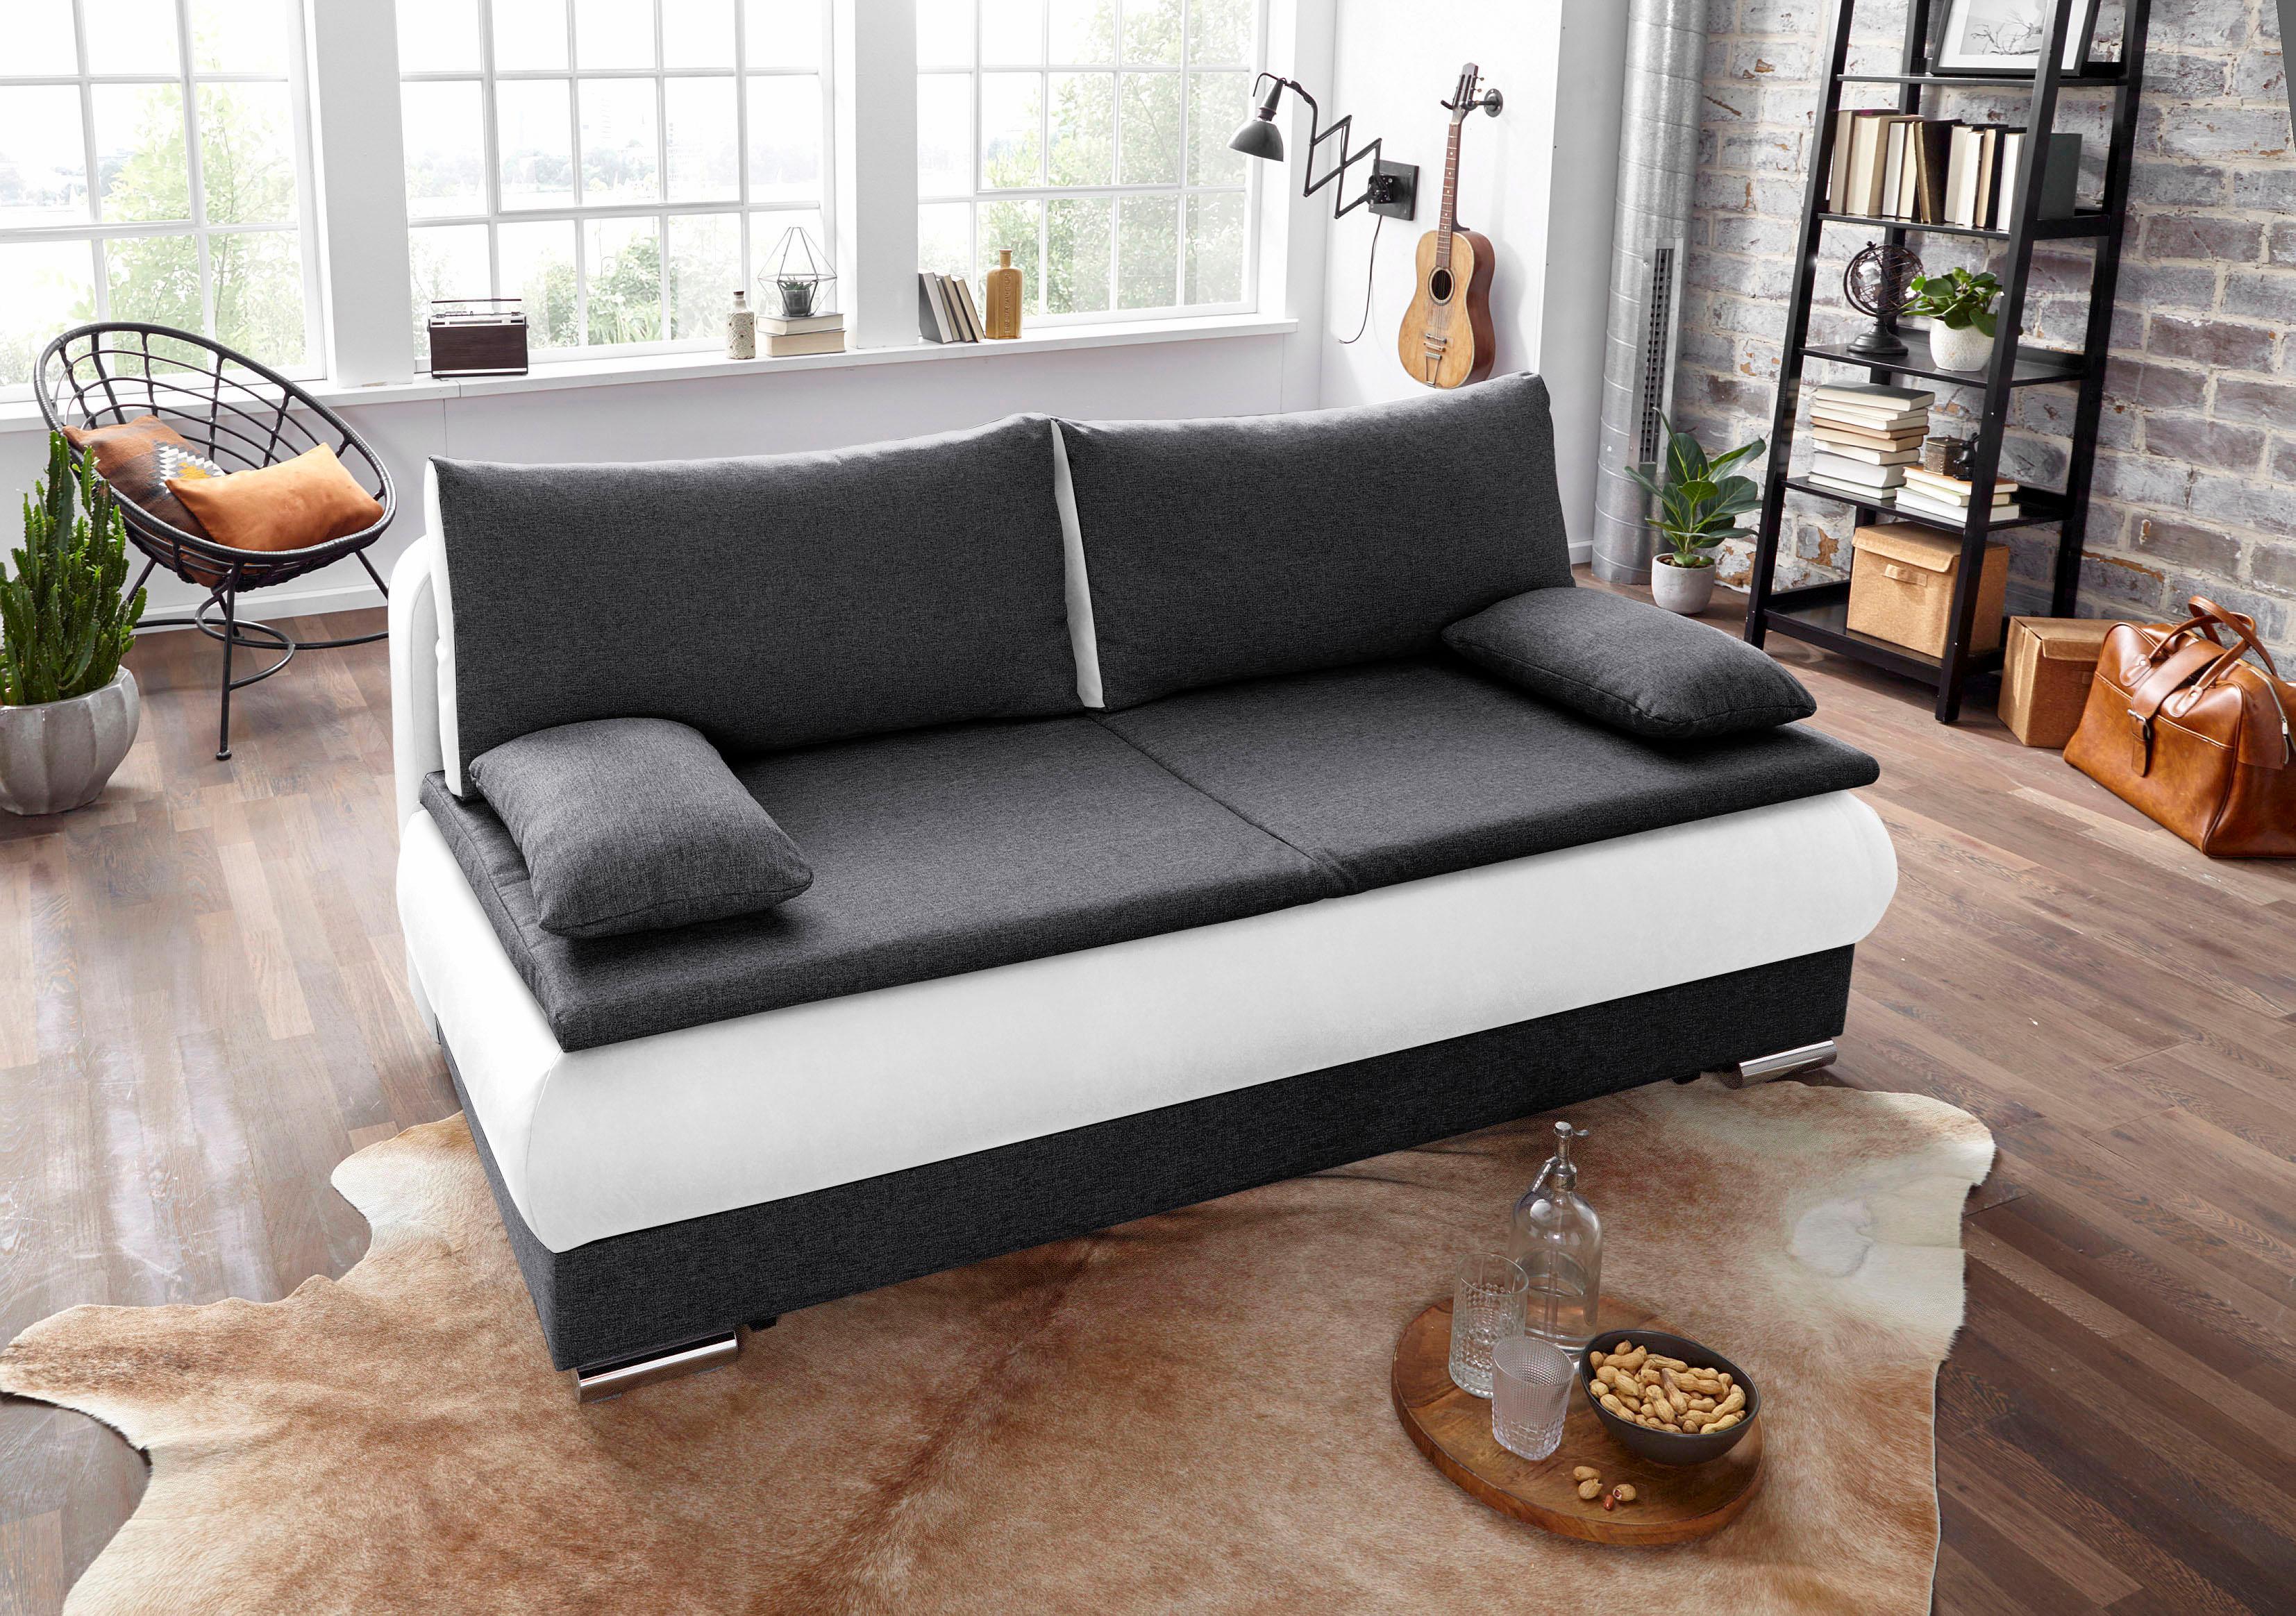 collection ab schlafsofa bestellen baur. Black Bedroom Furniture Sets. Home Design Ideas